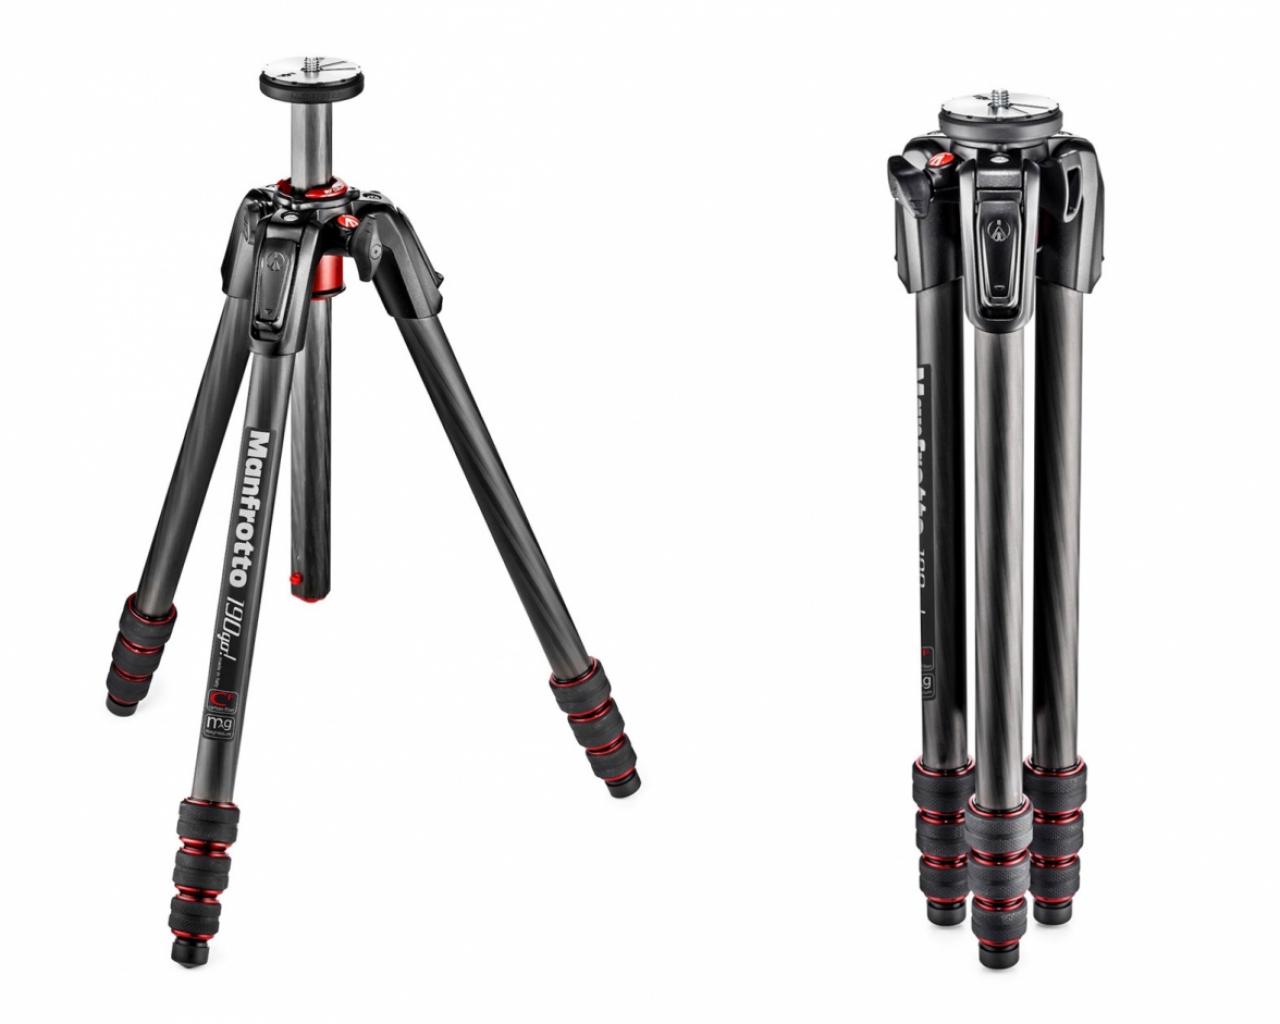 Godox 304 treppiede Sistema di illuminazione 3 gamba//gambe Nero